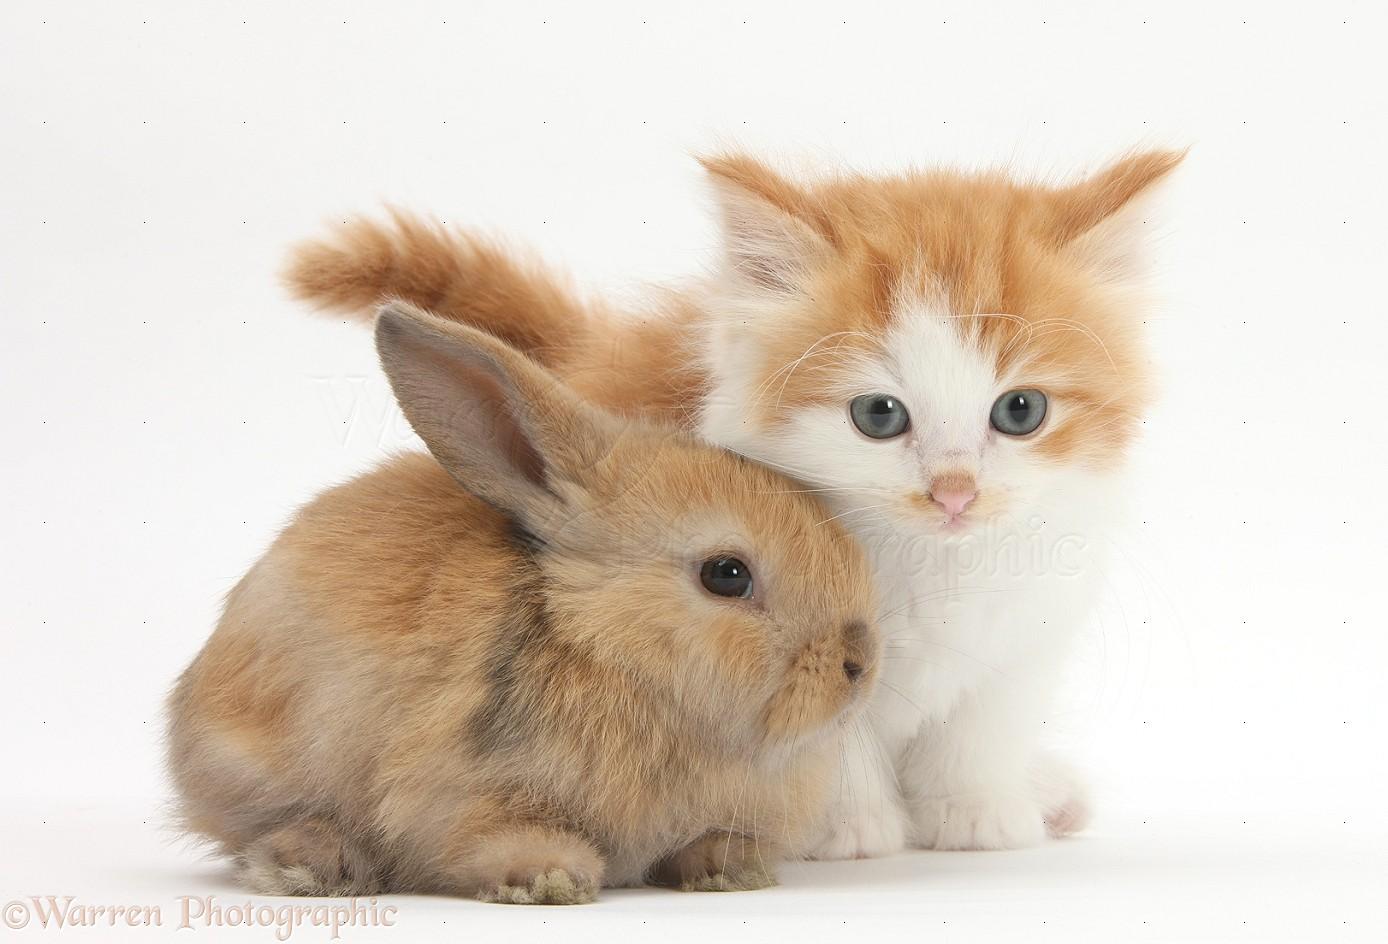 Pets Ginger And White Kitten Baby Rabbit Photo Wp30891